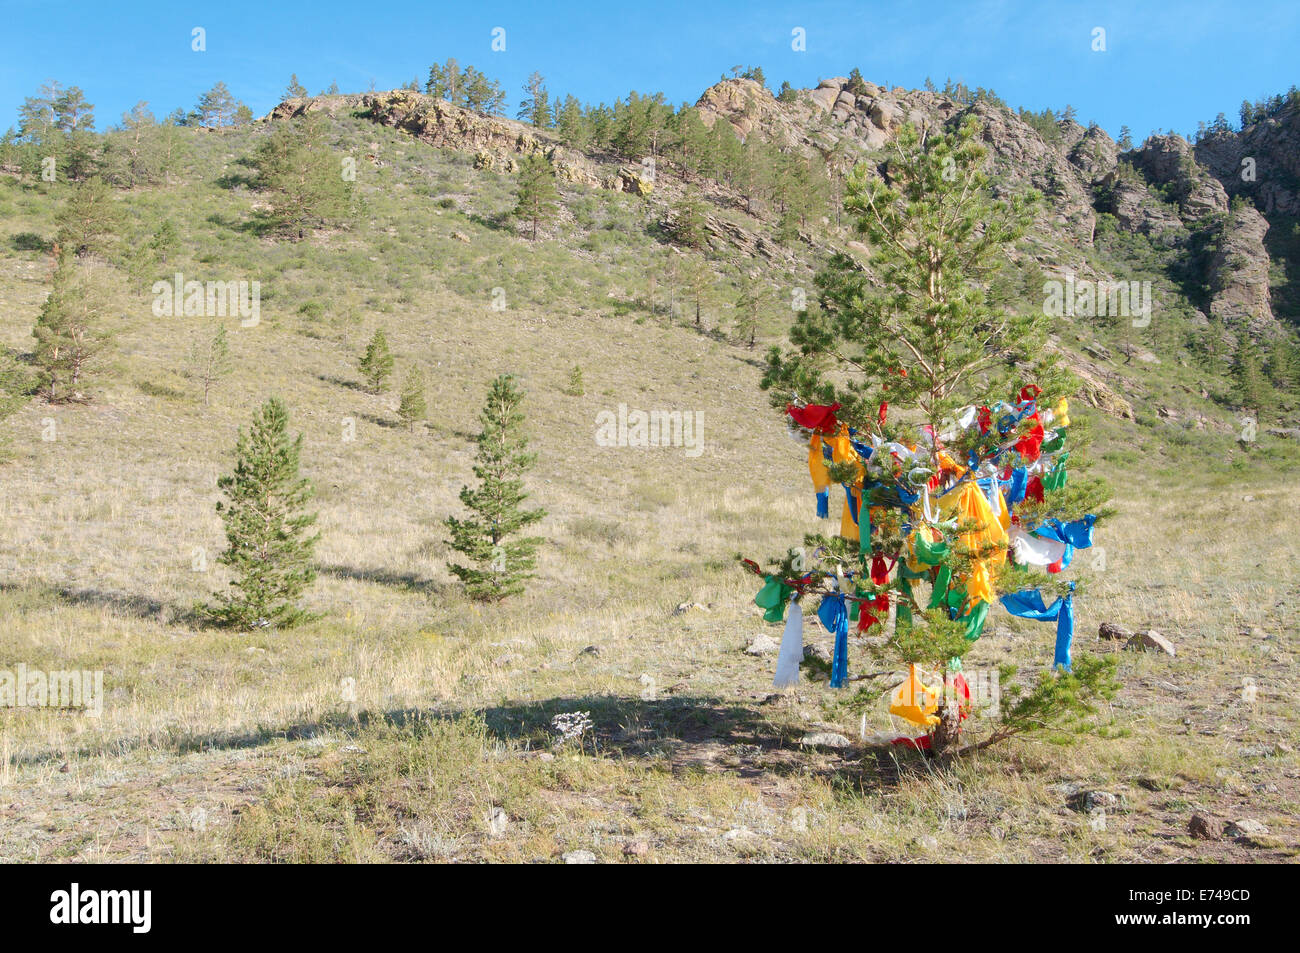 The tree of wishes. Merkit tract, Buryatia, Siberia, Russian Federation - Stock Image